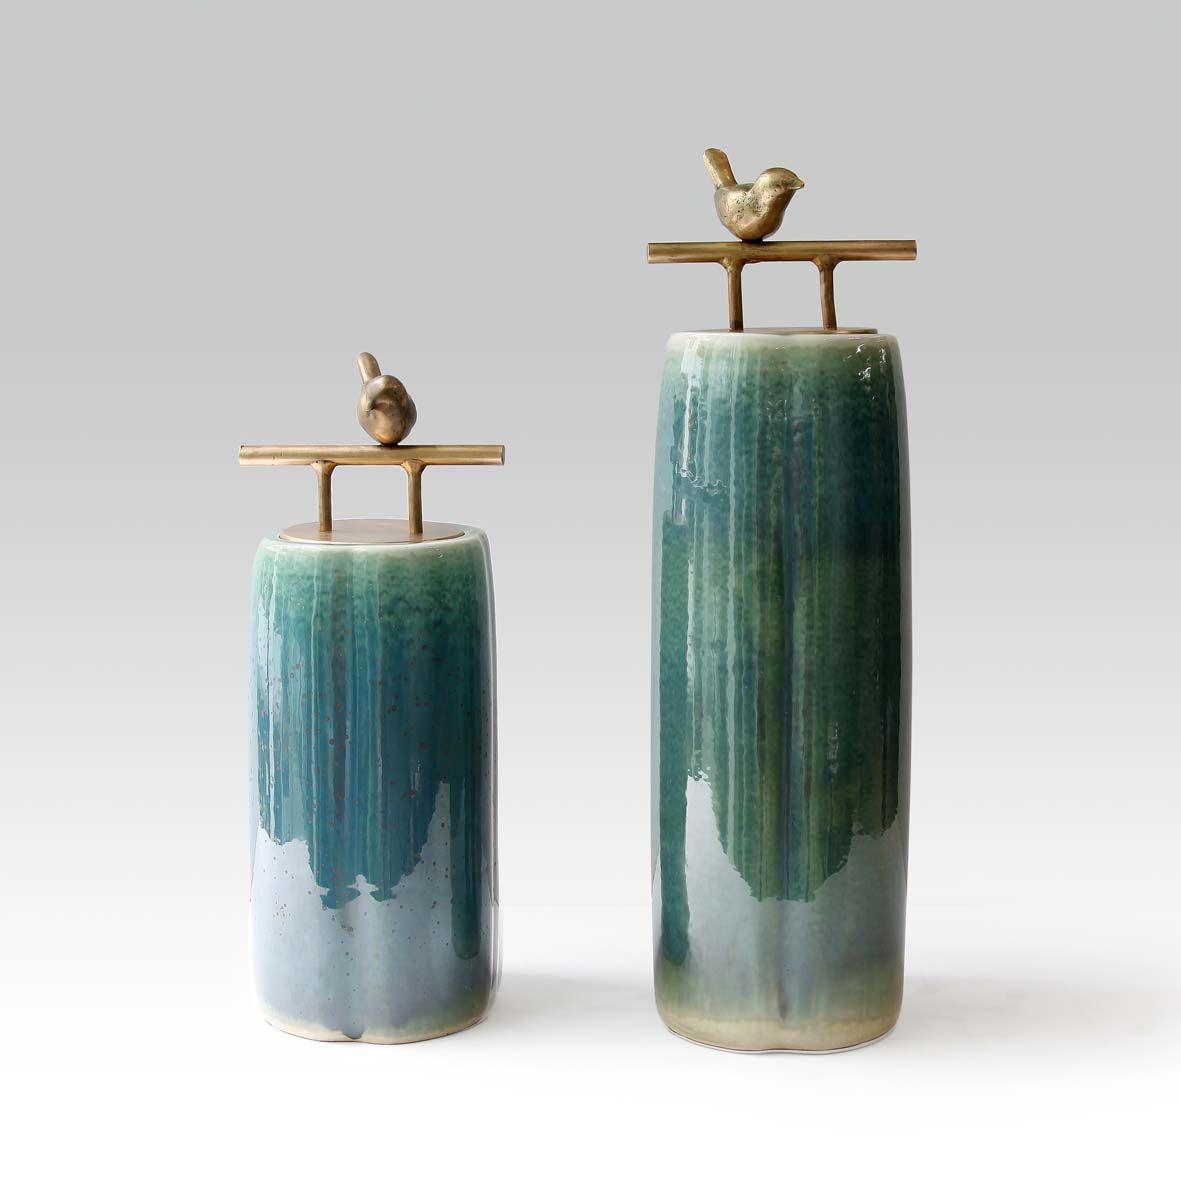 ceramic sculpture deco  branch bird 装饰  陶瓷 书法  摆件 屏风  鸟 透明 金属